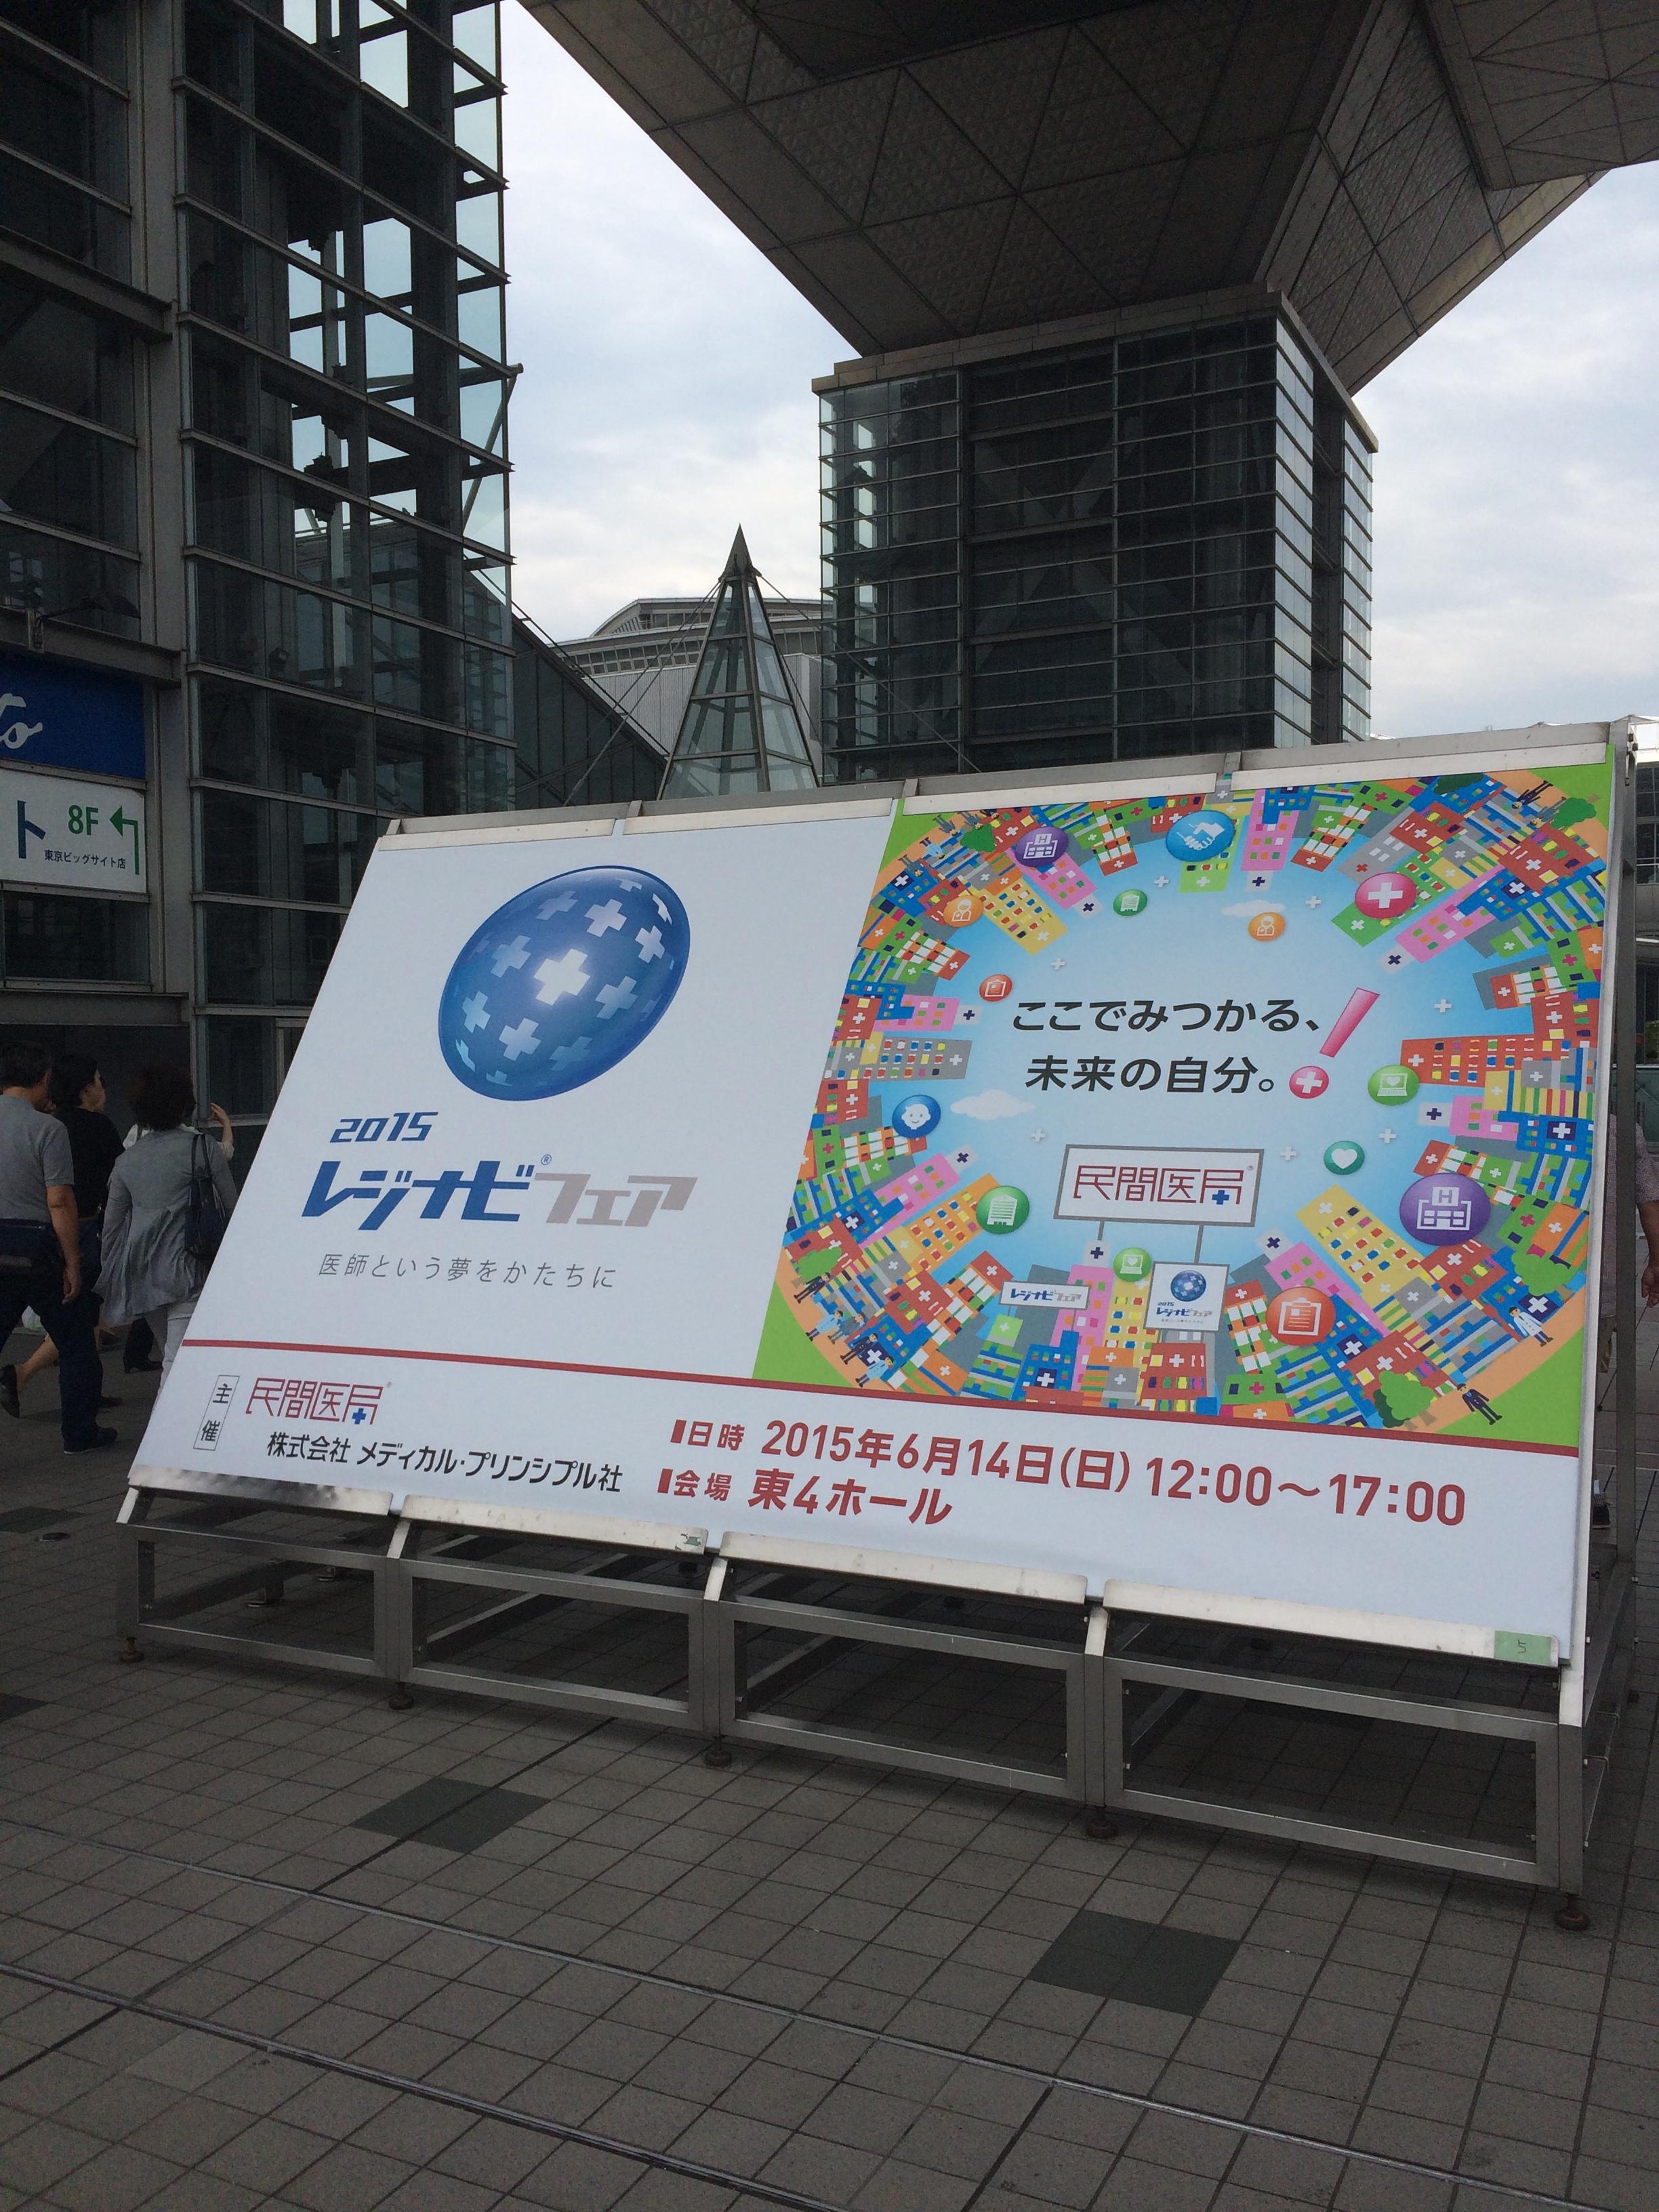 http://chichibu-med.jp/news/84517A19-8E05-445E-AD59-5B20E949A9EA.JPG